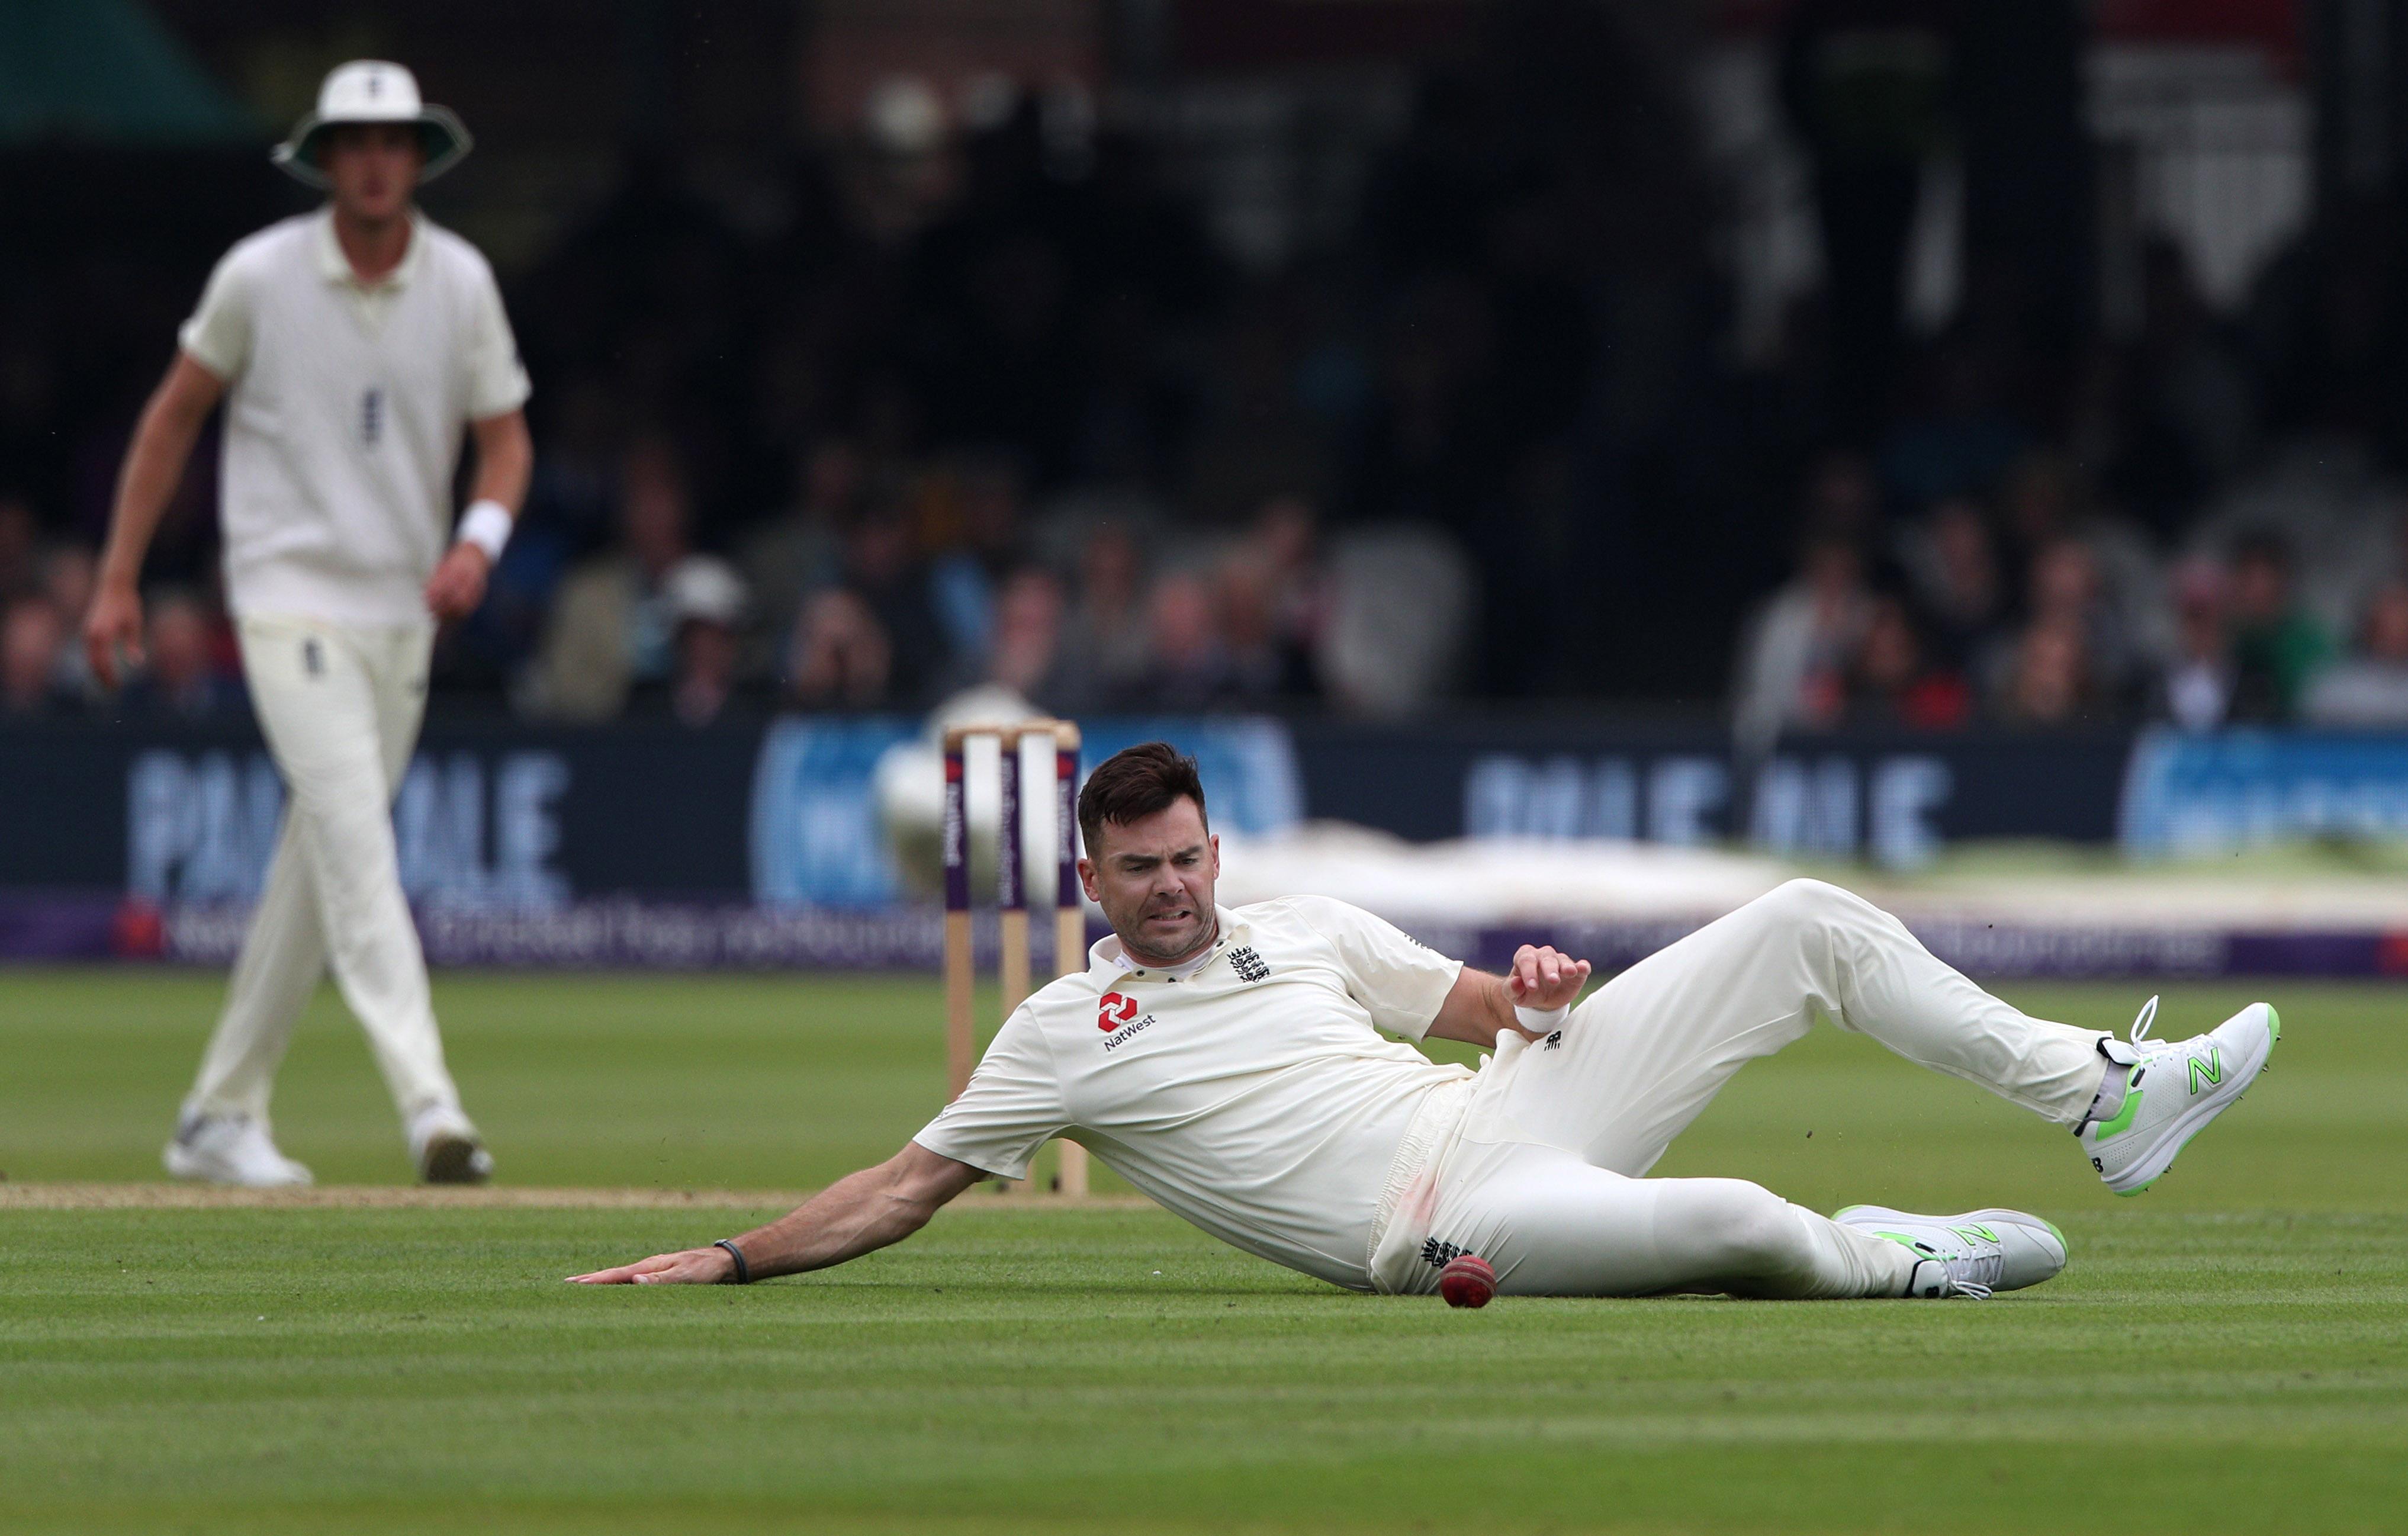 England's bowlers failed to make major inroads into the Pakistan line-up